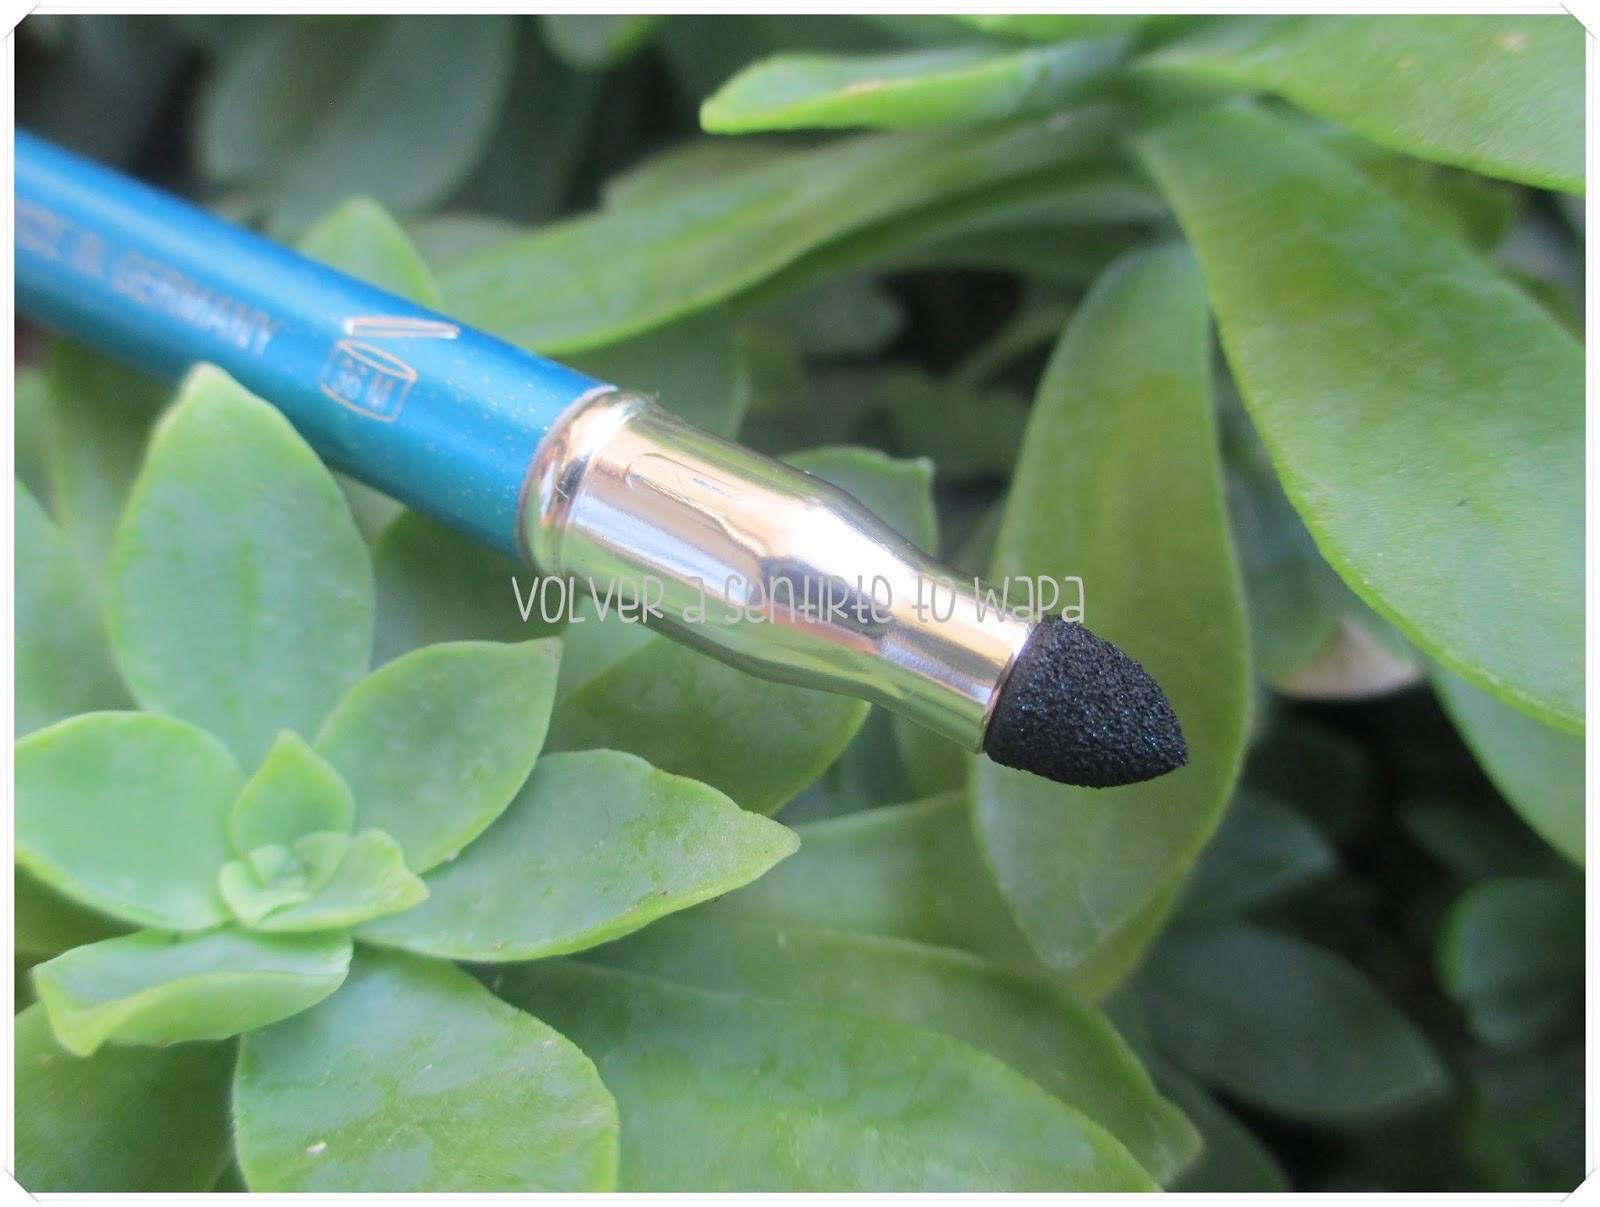 Crayon Yeux Waterproof de CLARINS - 04 Turquoise